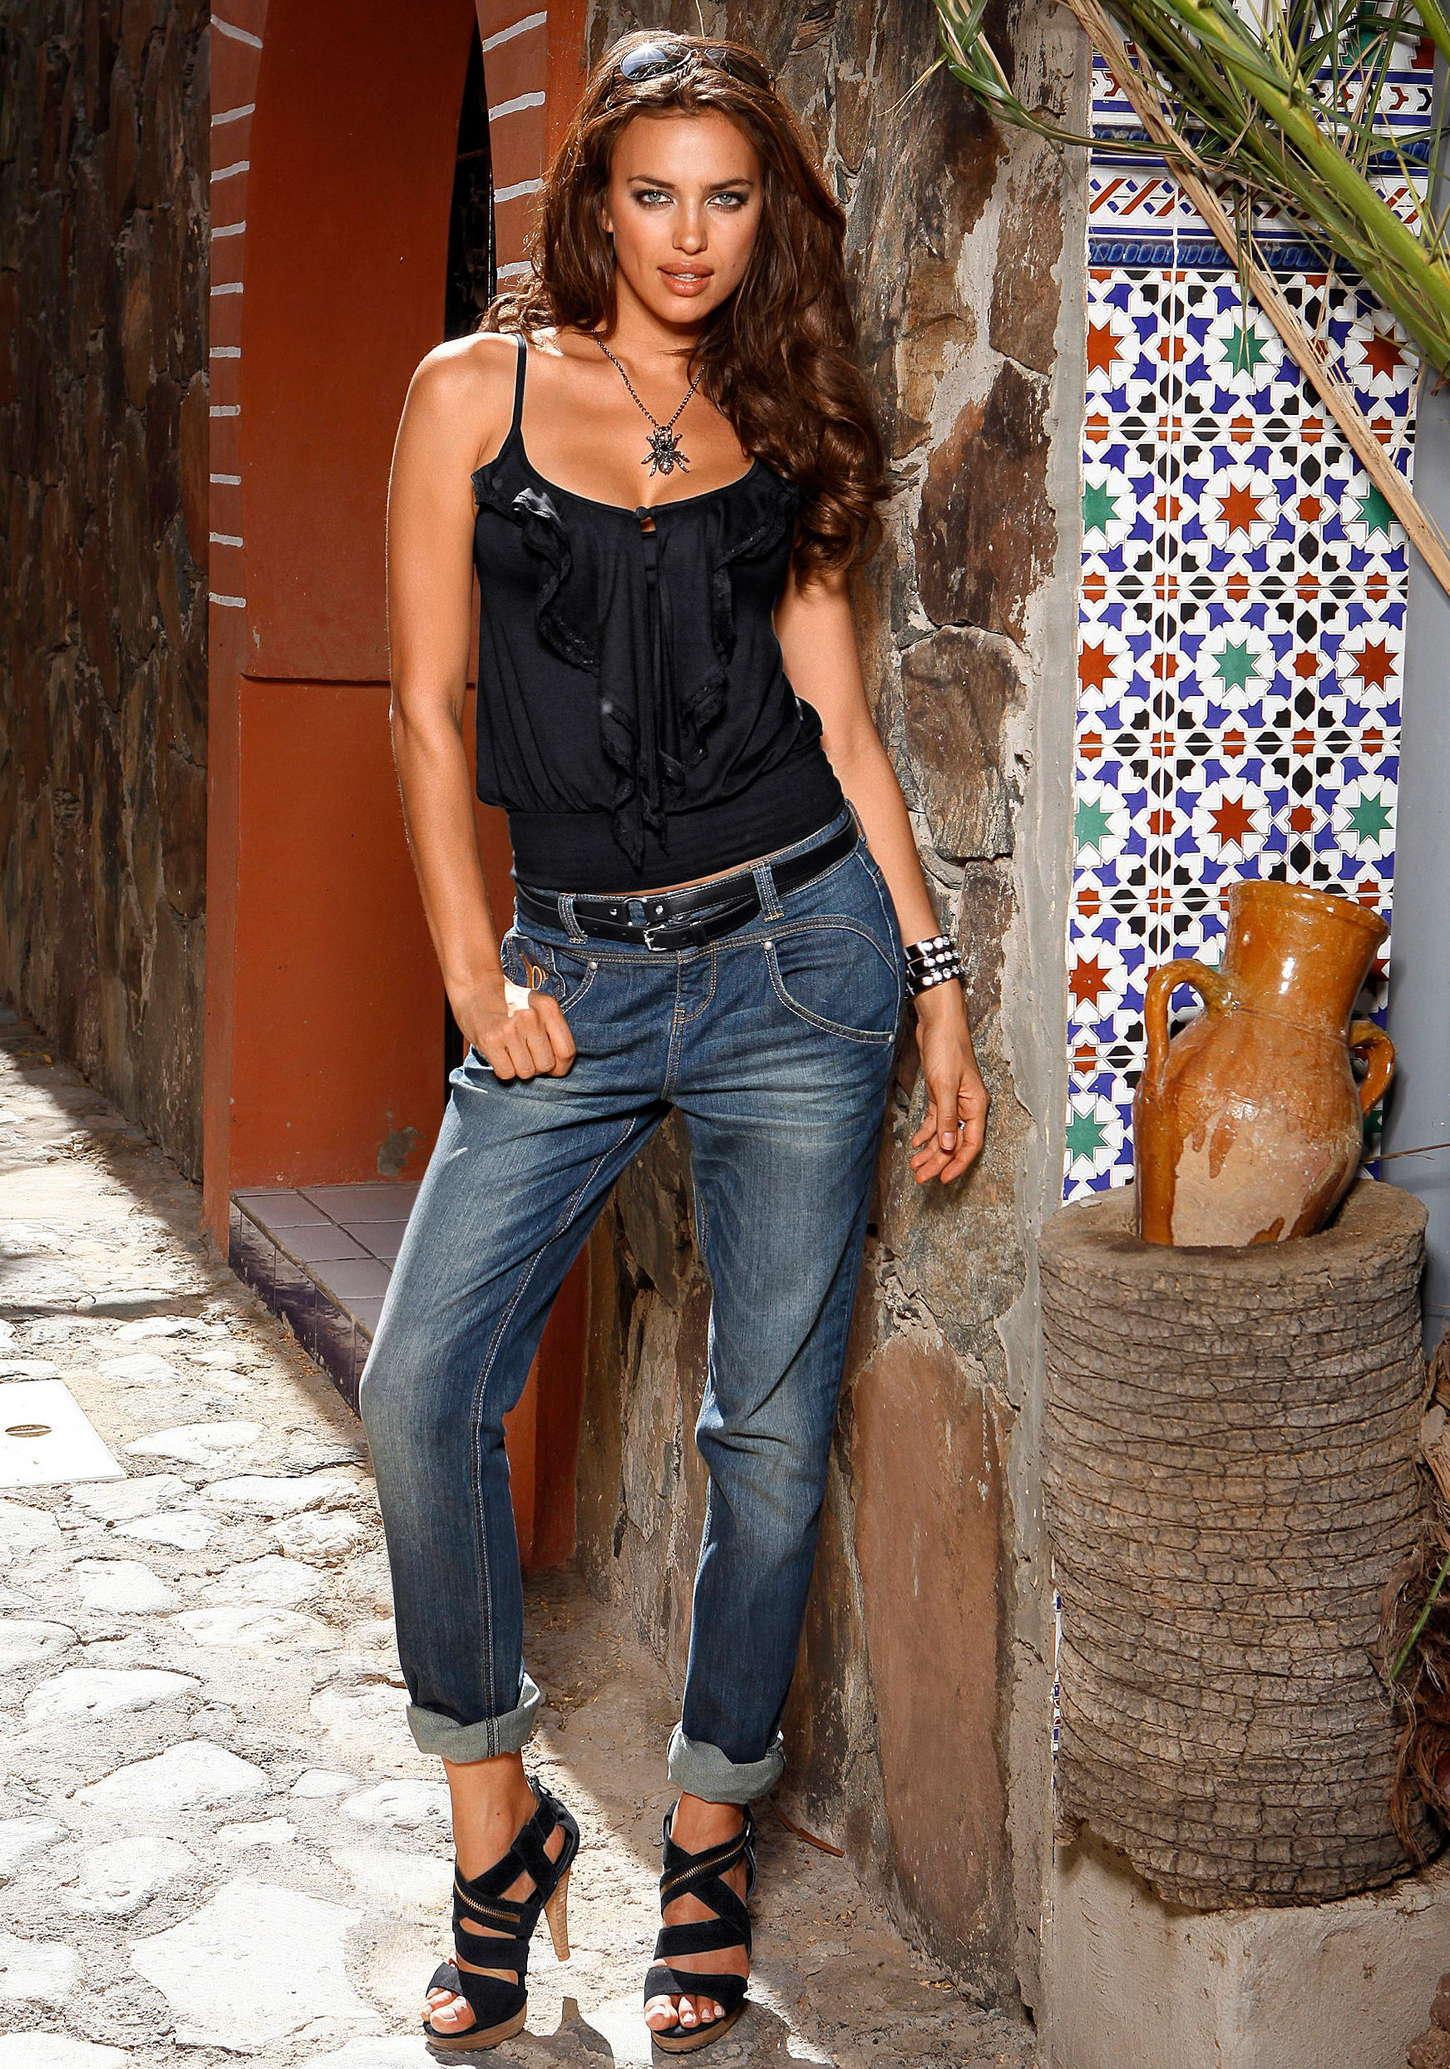 irina shayk 2012 laura scott collection 08 gotceleb. Black Bedroom Furniture Sets. Home Design Ideas